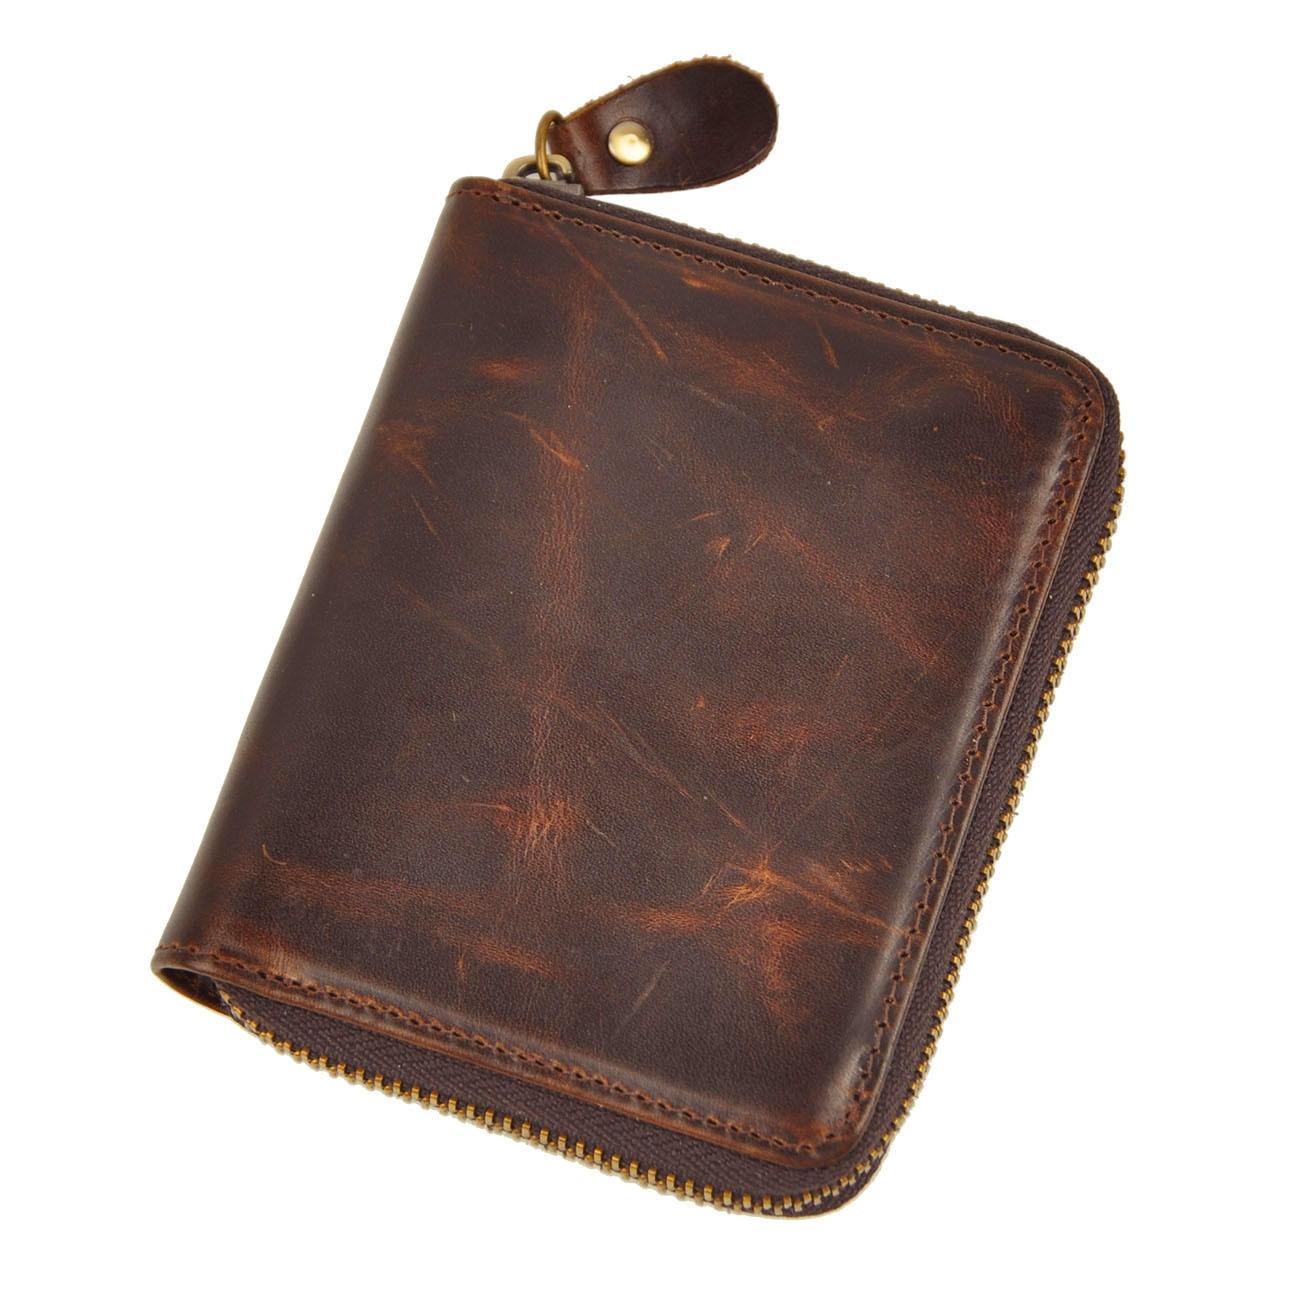 Mens' Zipper Genuine Tan Leather Wallet Male Cowhide Coin Purse Vintage Short Wallet for Men(lots of pockets) kiniki sancho mens tan through swim micro mens